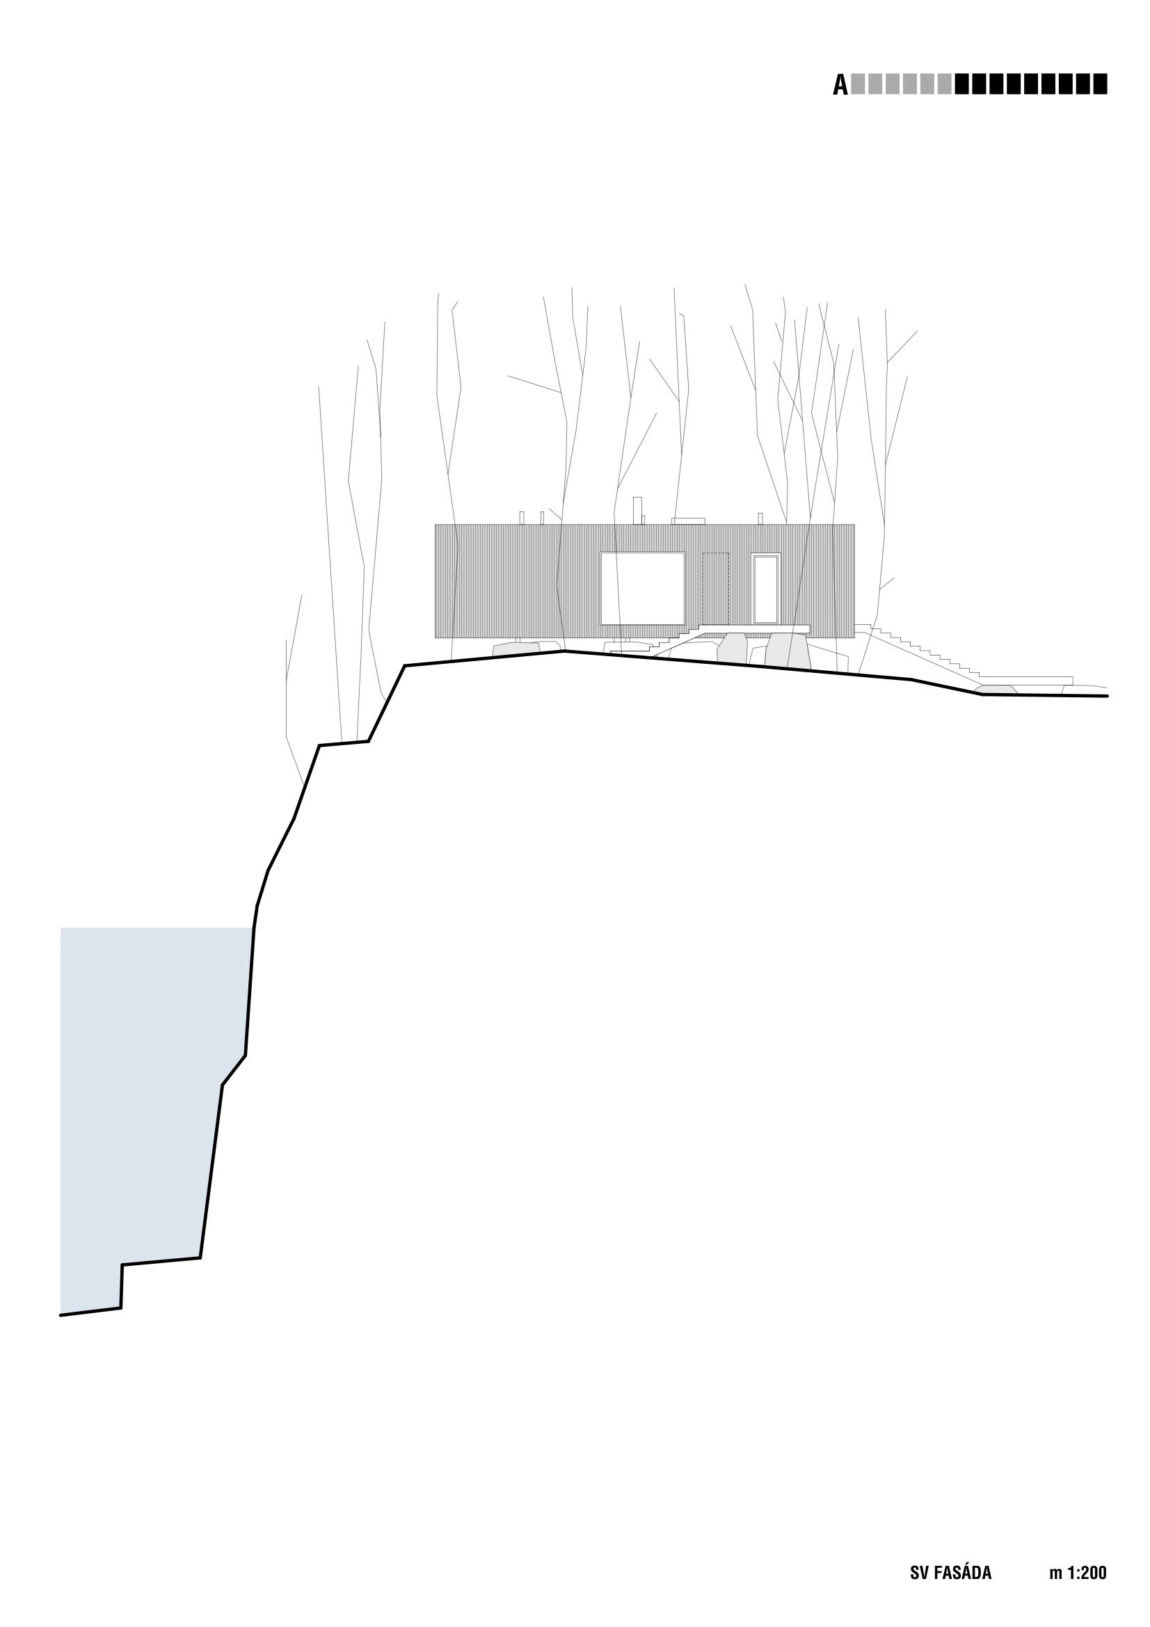 A Prototype of a Family House by a69 Architekti (13)